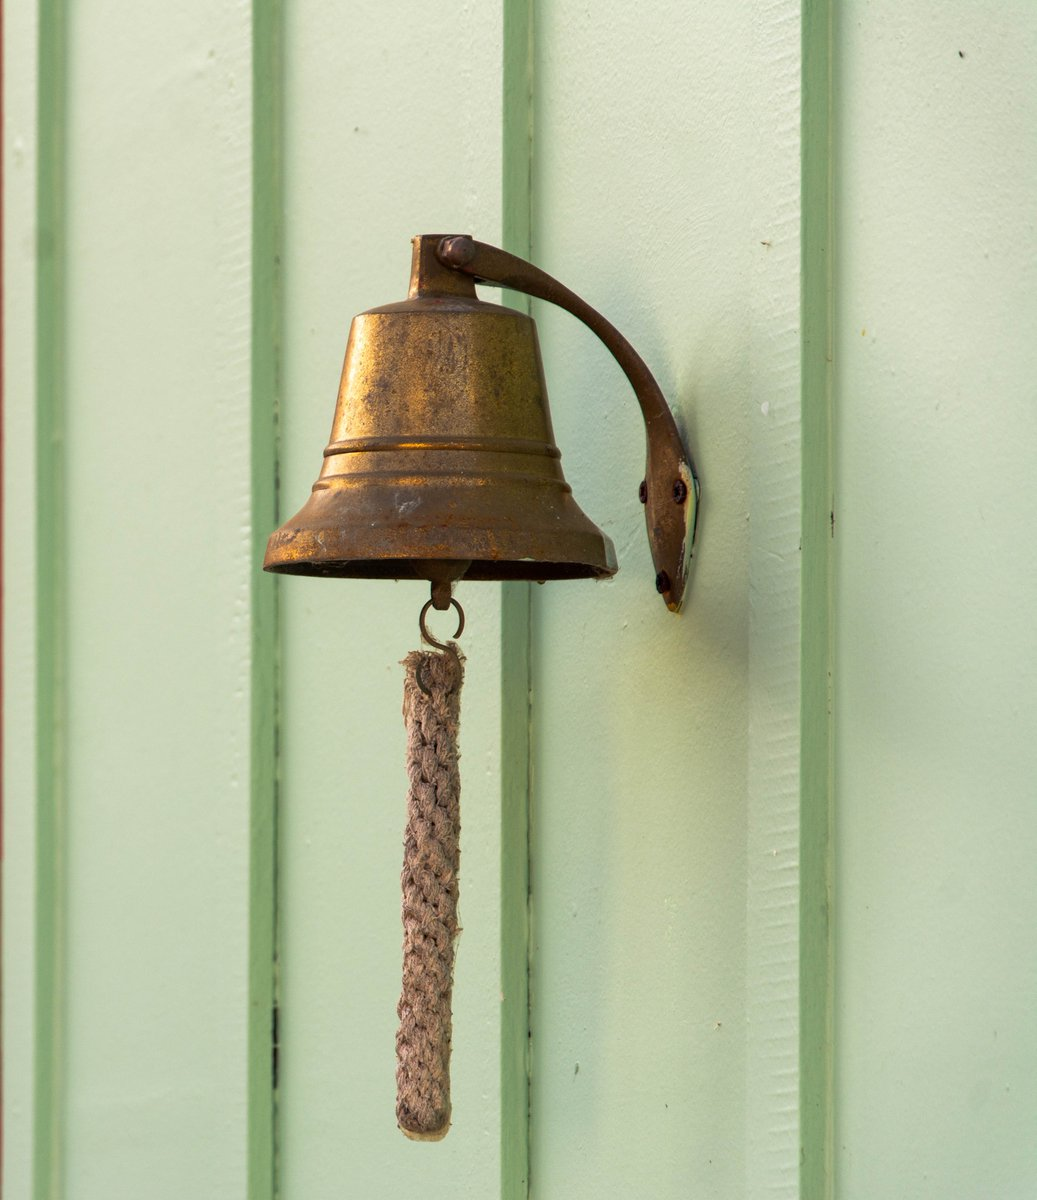 ADRIC Webinar - You Can't Un-Ring the Bell: Lessons Learned June 10, 11am-12:30pm EST. Facilitators: Anne Gottlieb, Hons. B.A., LL.B., LL.M., ADRIC Director; Josie Parisi, CPA, CA, CBV, CIRP, ADRIC Director & Treasurer #mediation #adr #arbitration https://t.co/2L6SXPGMPr